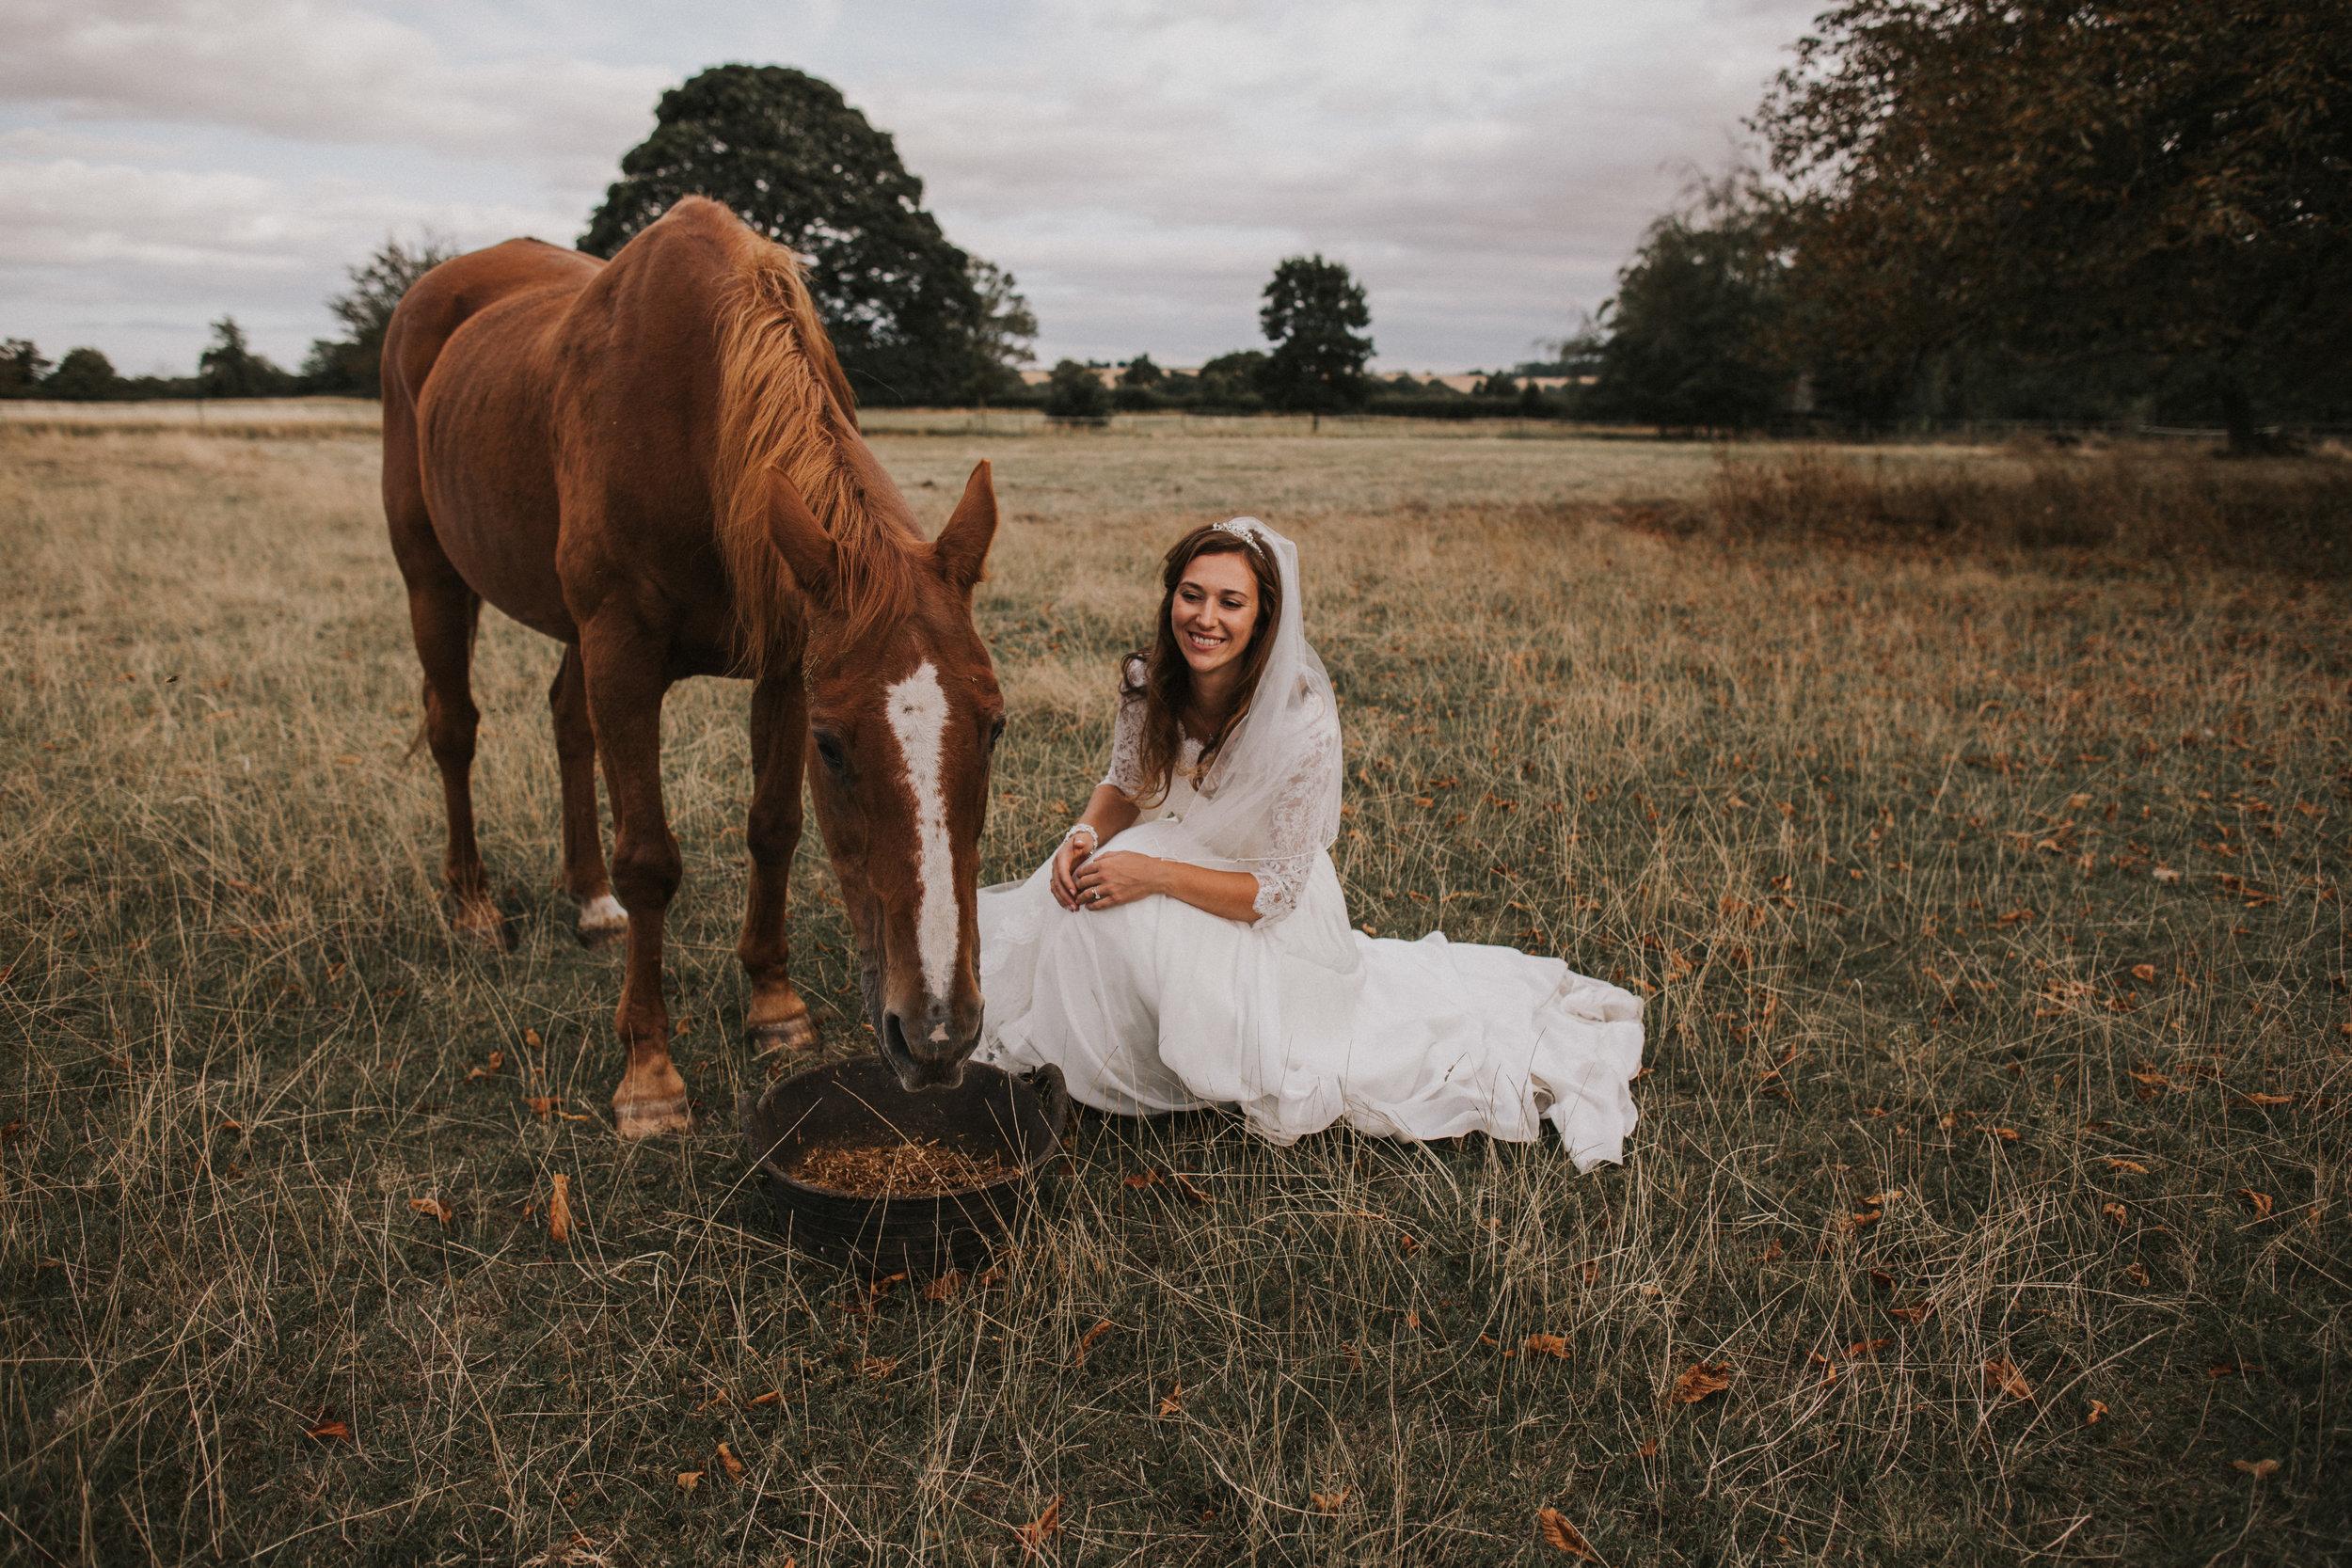 brook rose photography  Farm wedding_84.jpg